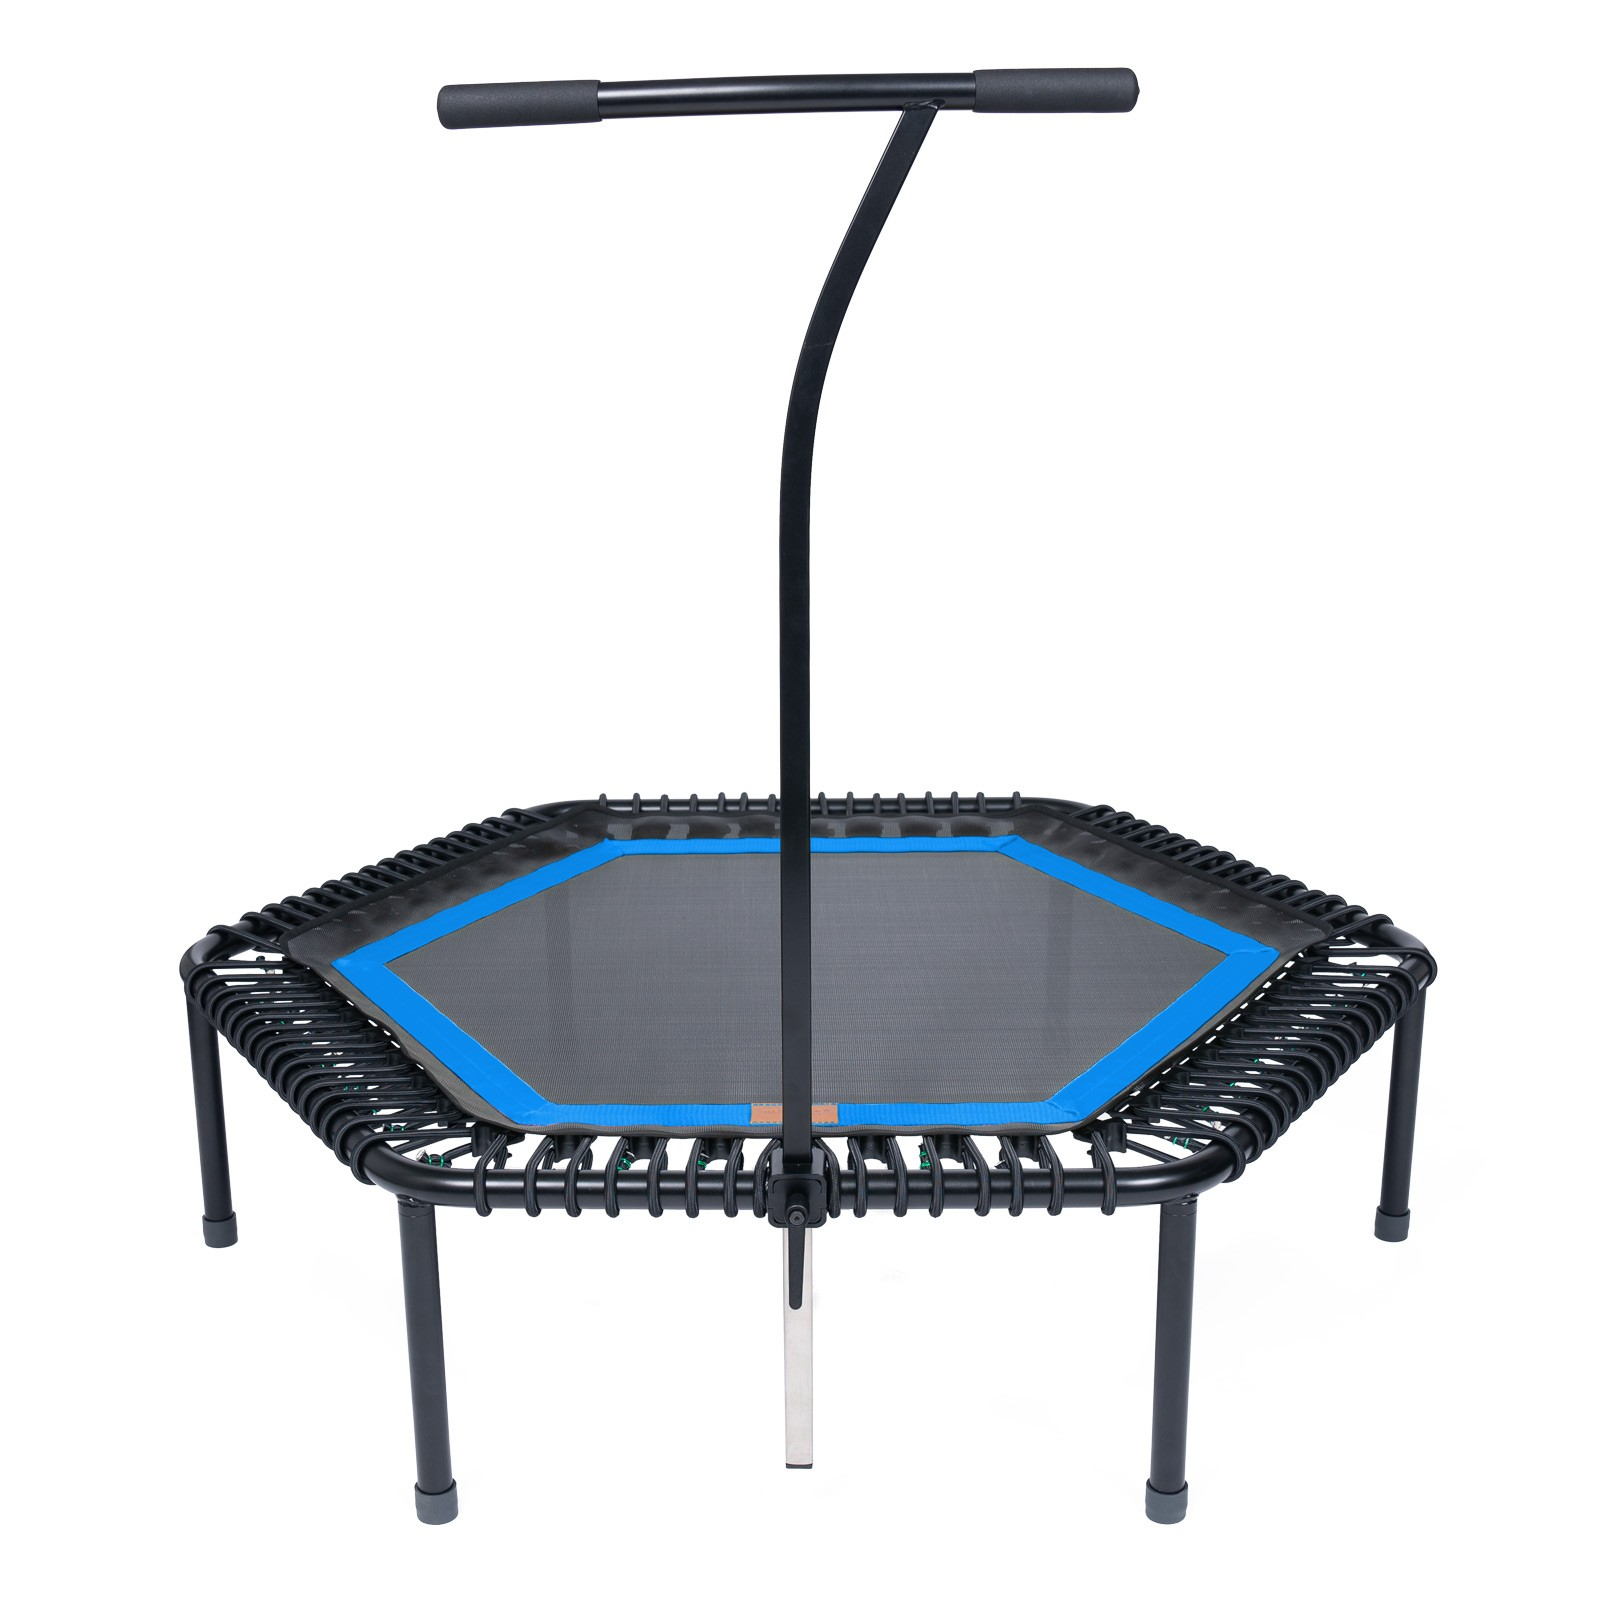 Bellicon Trampoline: Bellicon® Fitnesstrampoline Jumping Fitness Home